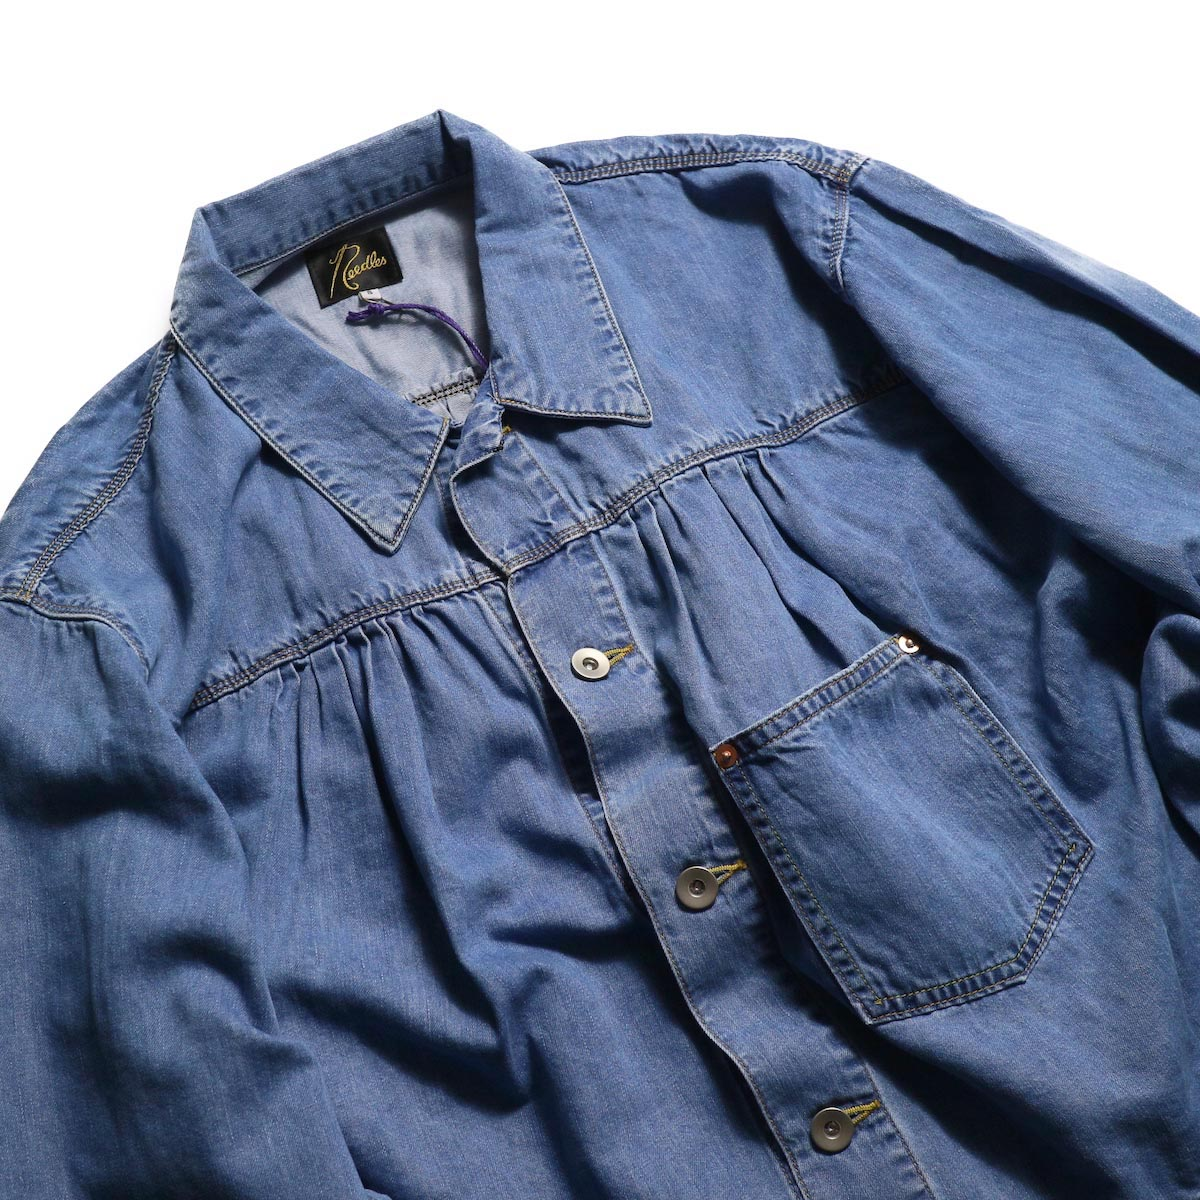 NEEDLES / Gathered Jean Jacket -7oz c/t denim 襟